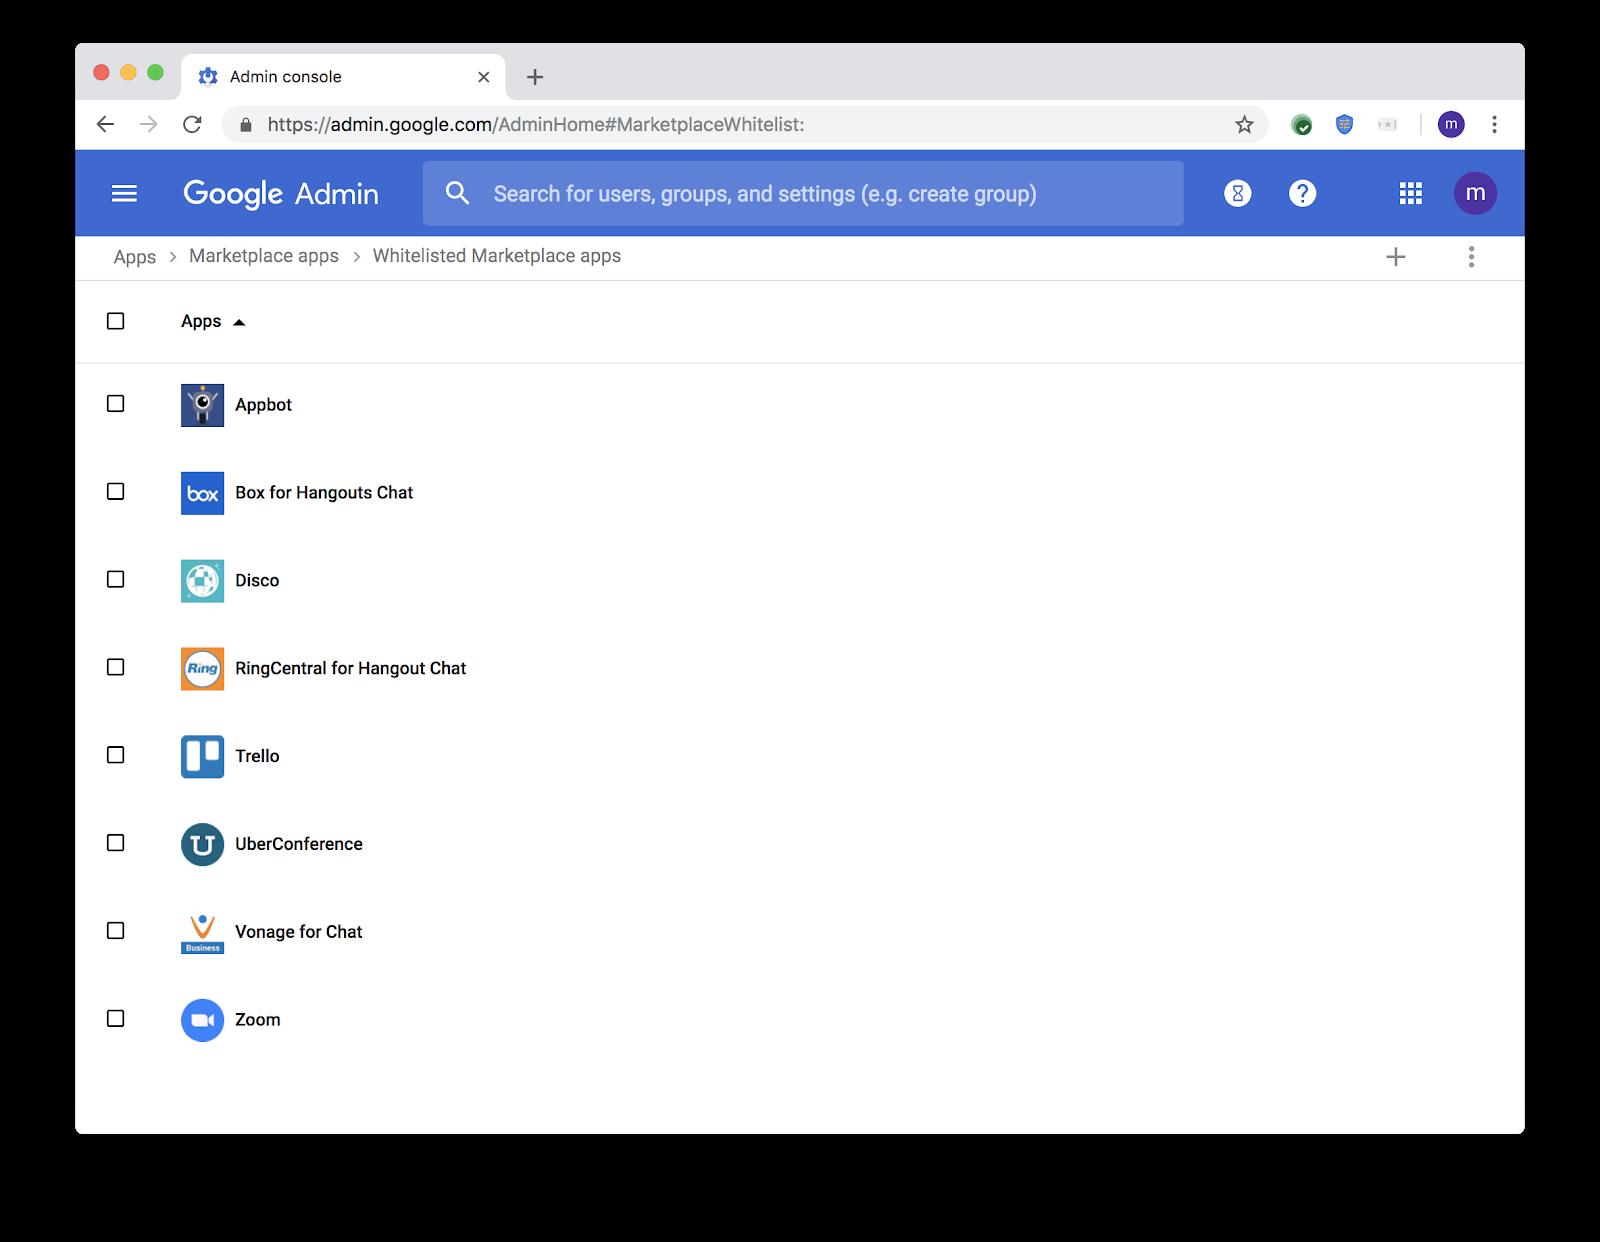 G Suite Updates Blog: Whitelist third-party bots for Hangouts Chat